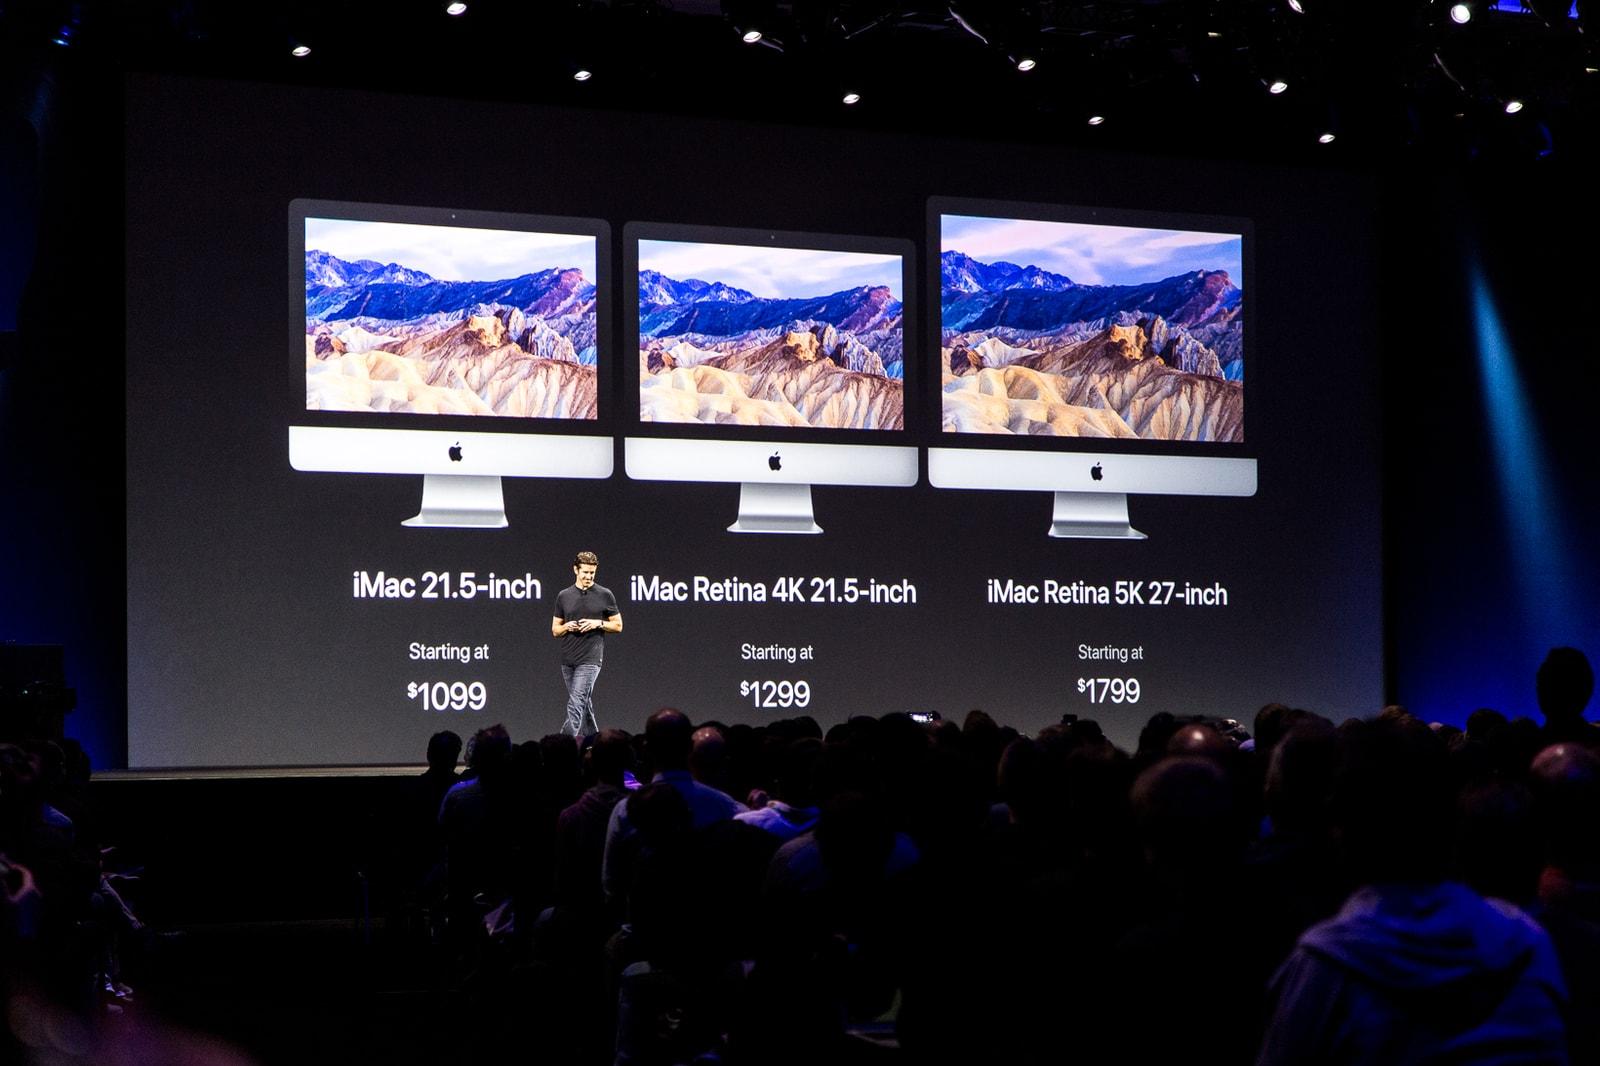 Apple iOS WWDC iPhone iPad Pro Macbook Mac OS